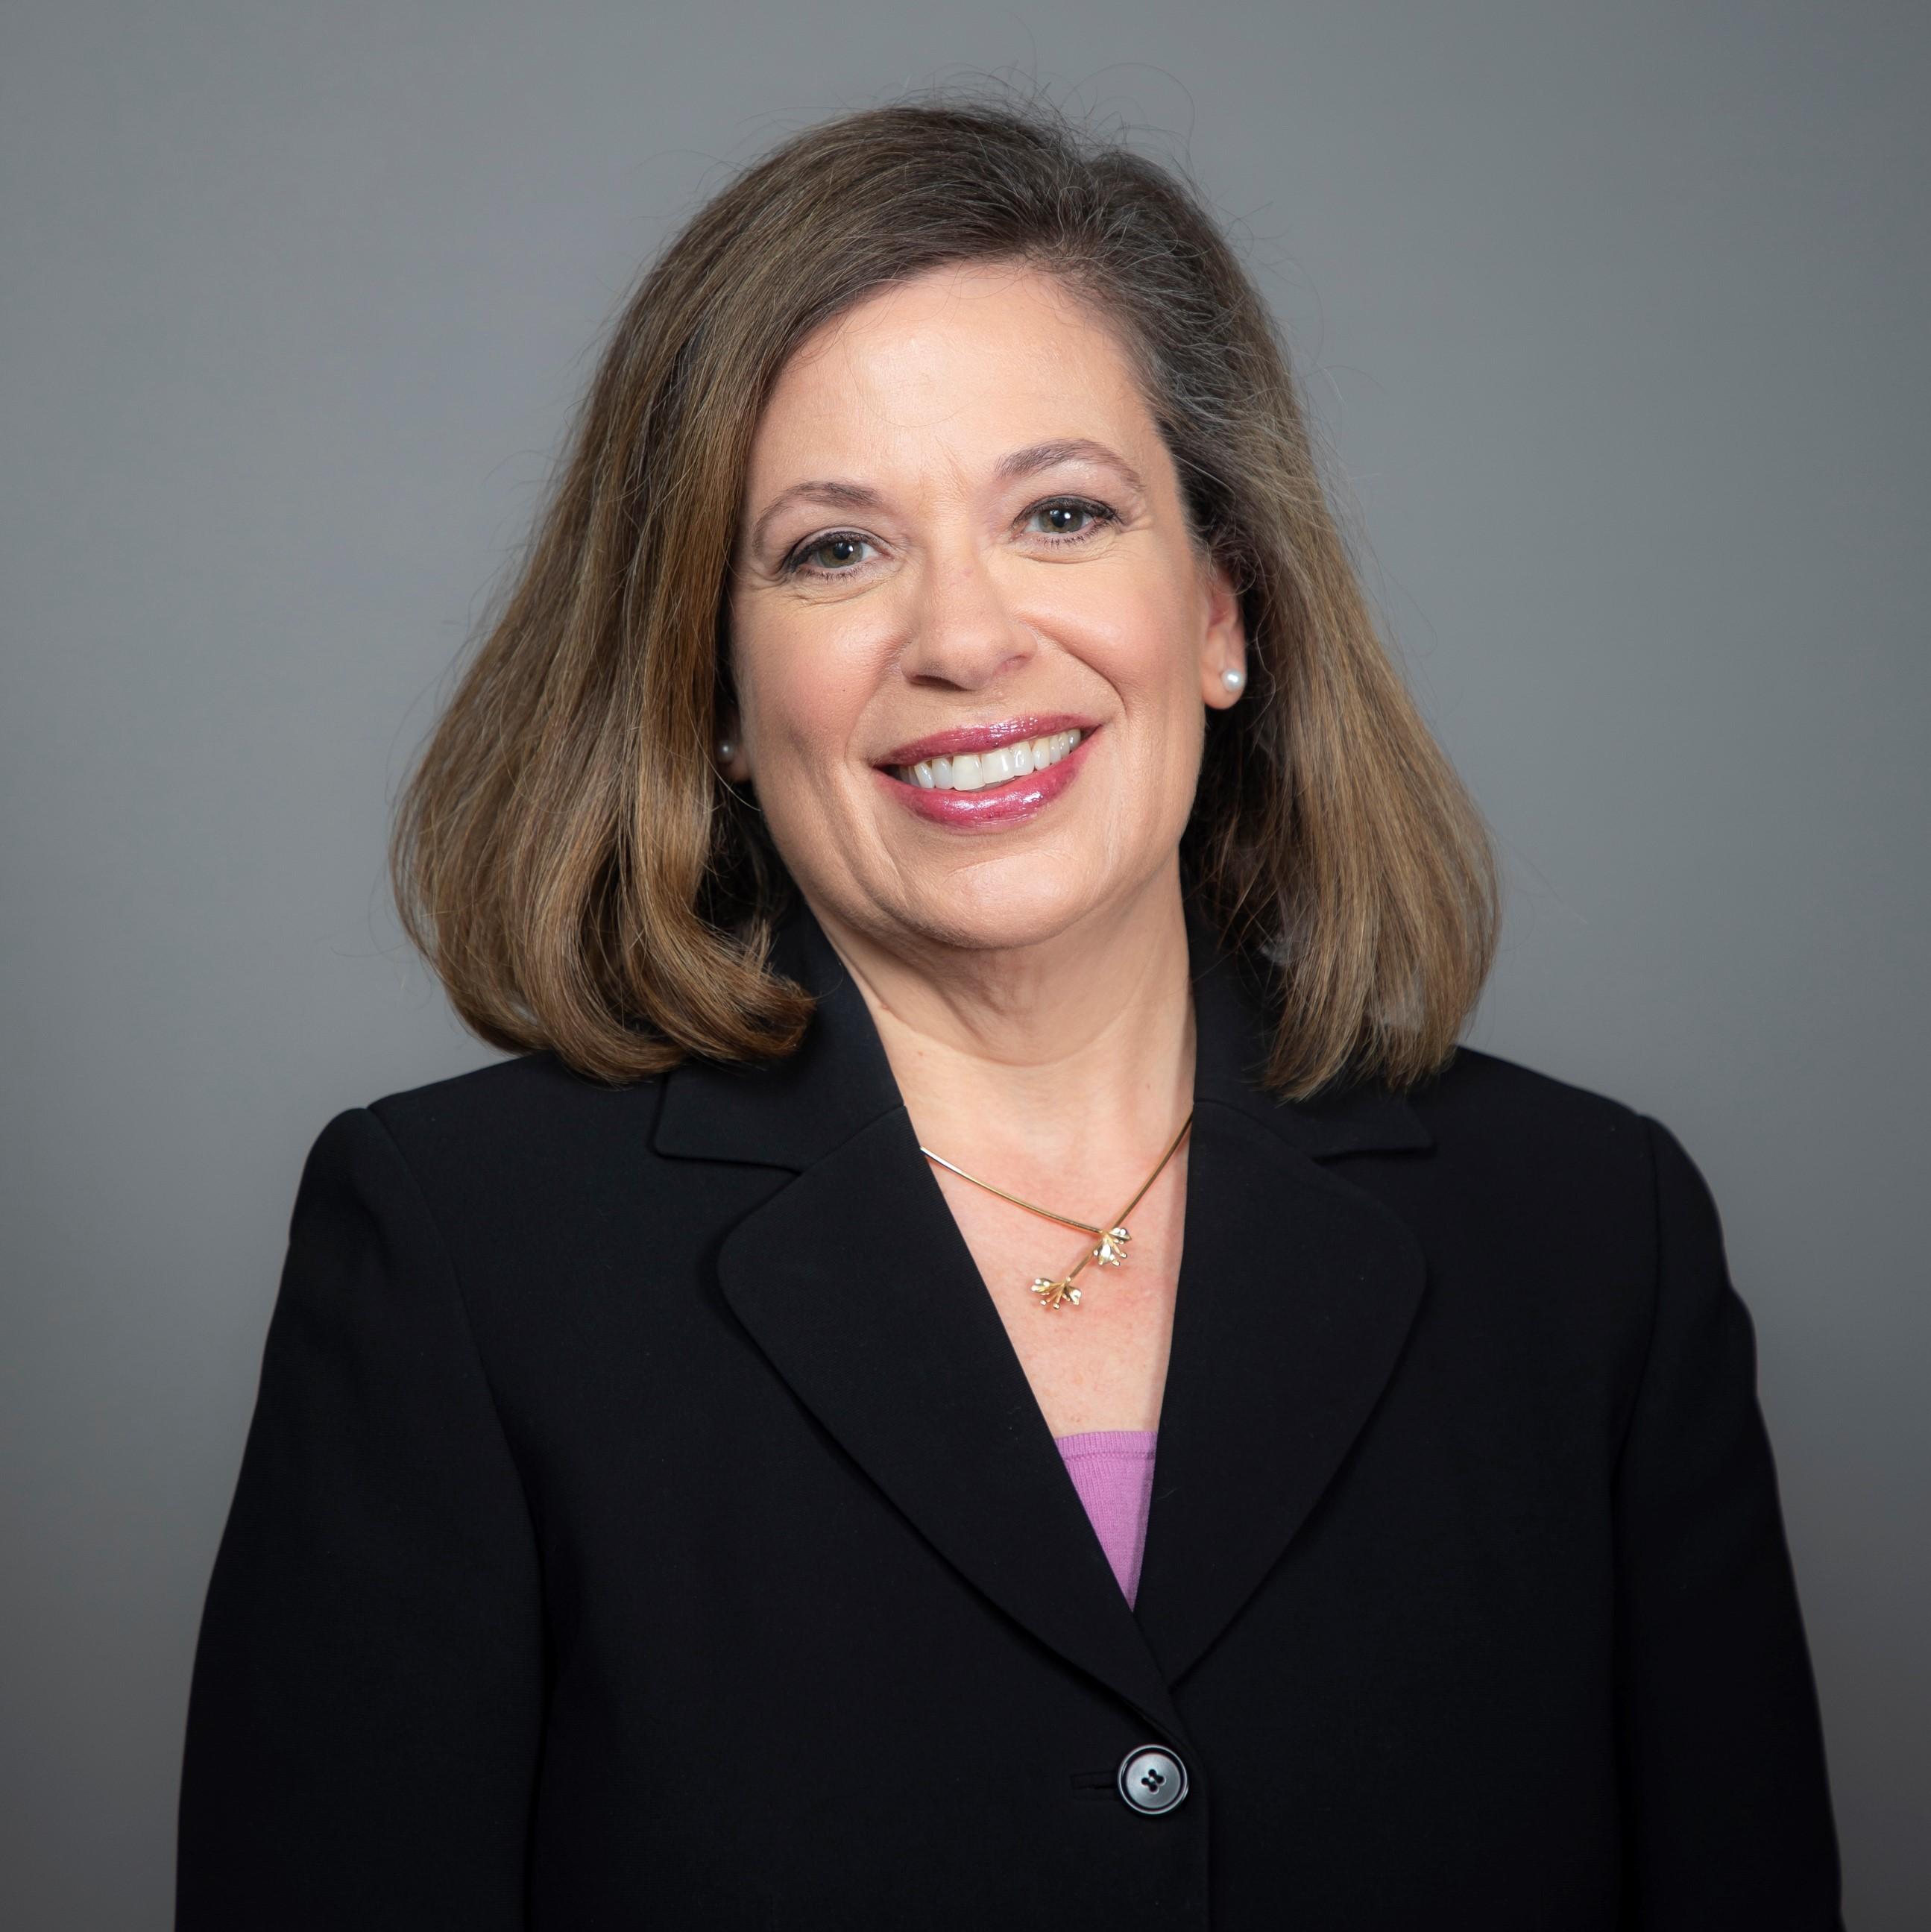 Cynthia Daly